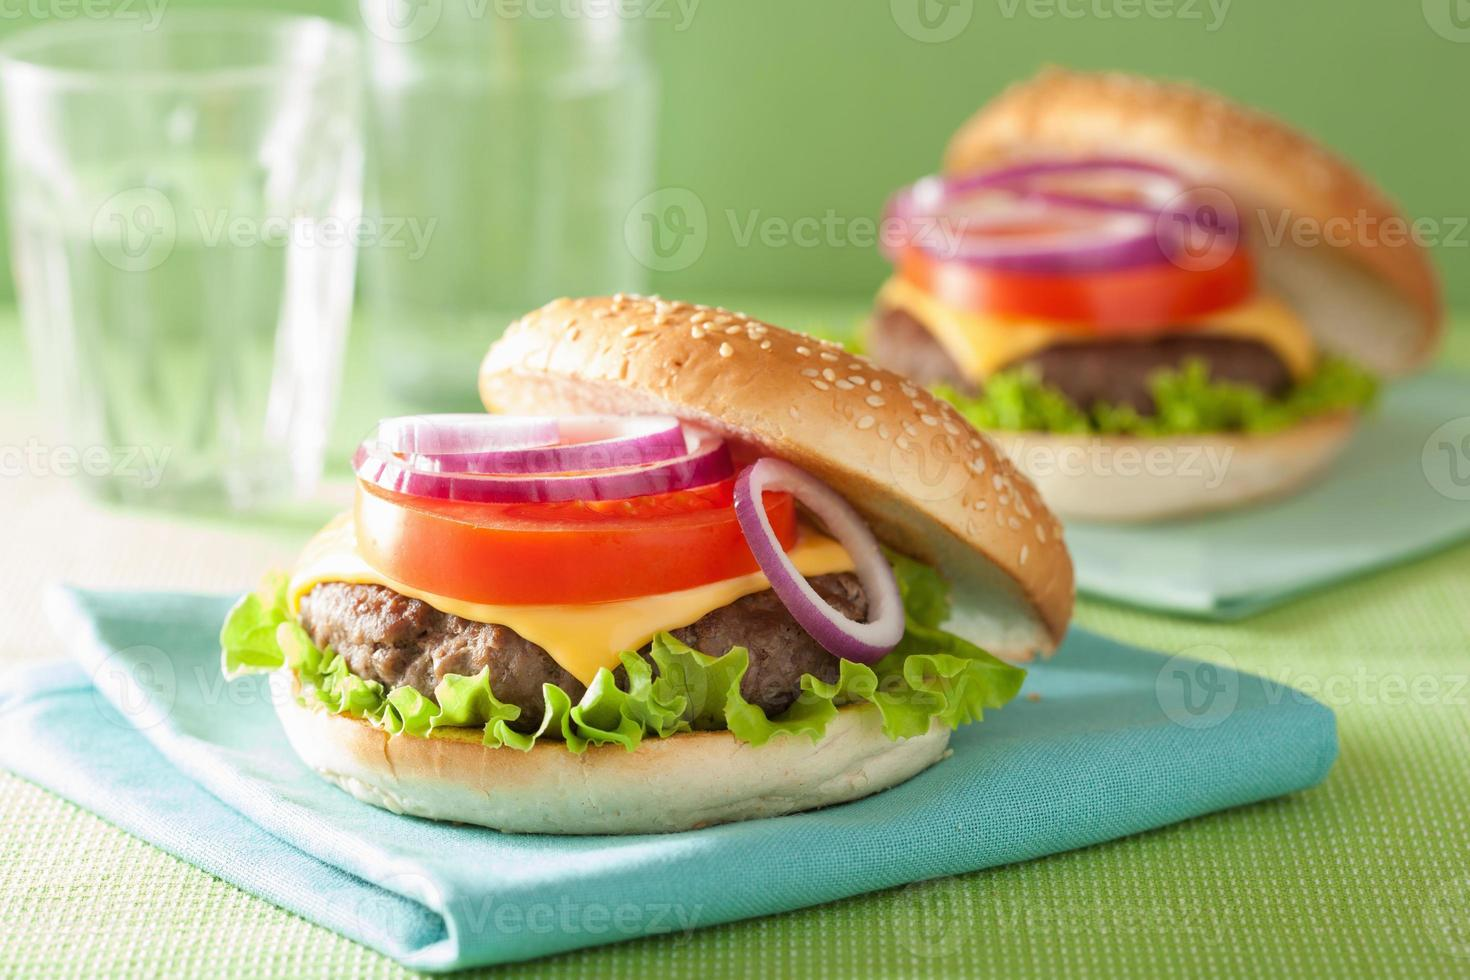 cheeseburger com carne ralada queijo alface cebola tomate foto